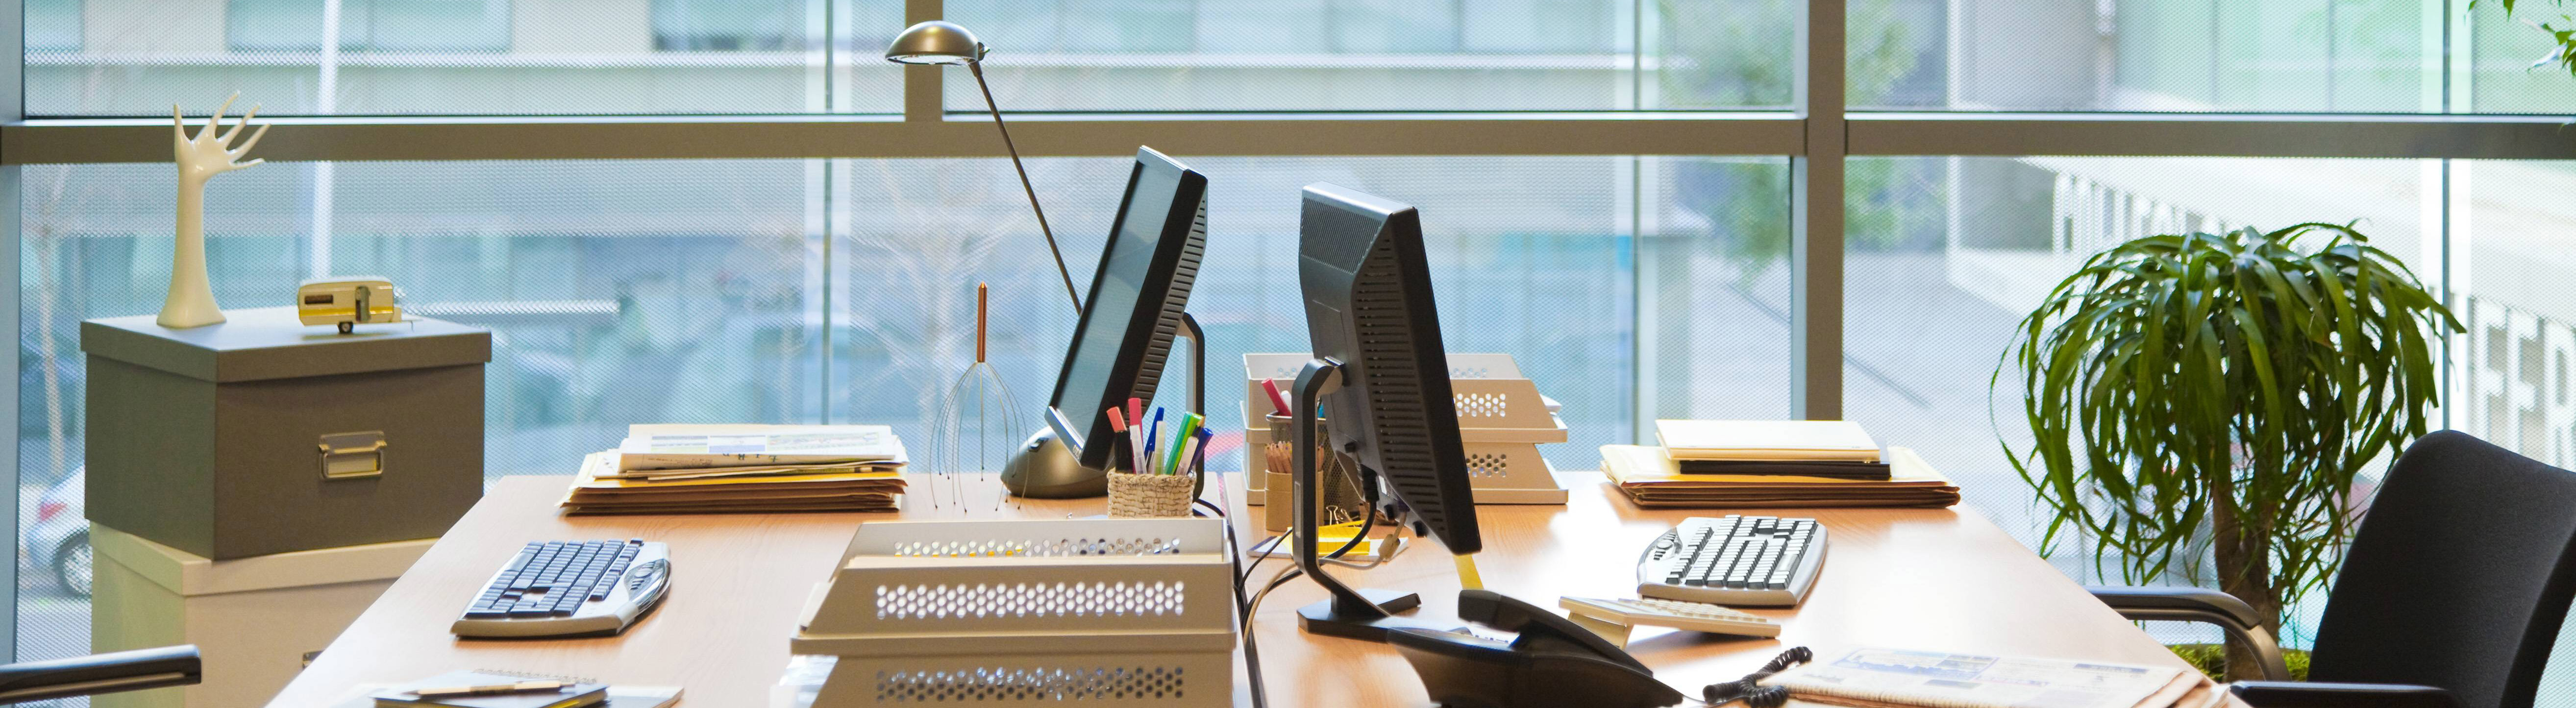 Leeres Büro